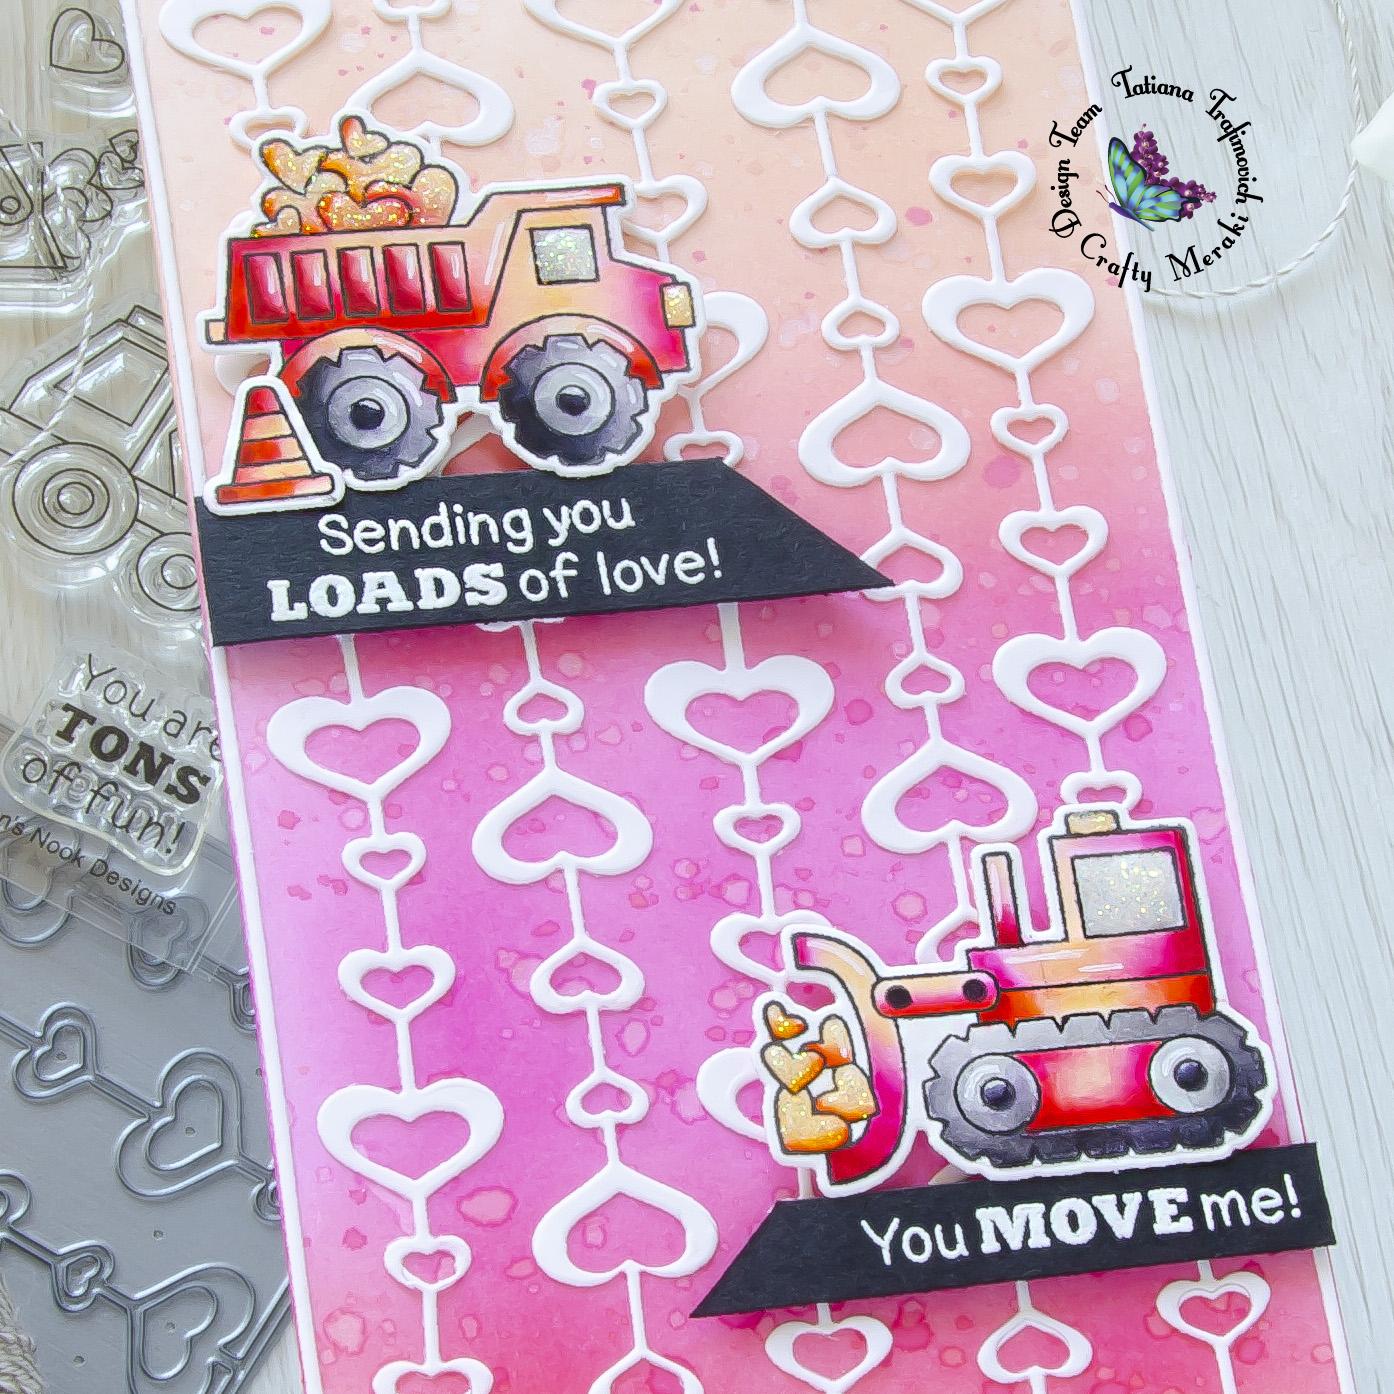 Sending You Loads of Love #handmade card by Tatiana Trafimovich #tatianacraftandart - Live Quarry stamp set by Newton's Nook Designs #newtonsnook and Eccentric Hearts die by Crafty Meraki #craftymeraki